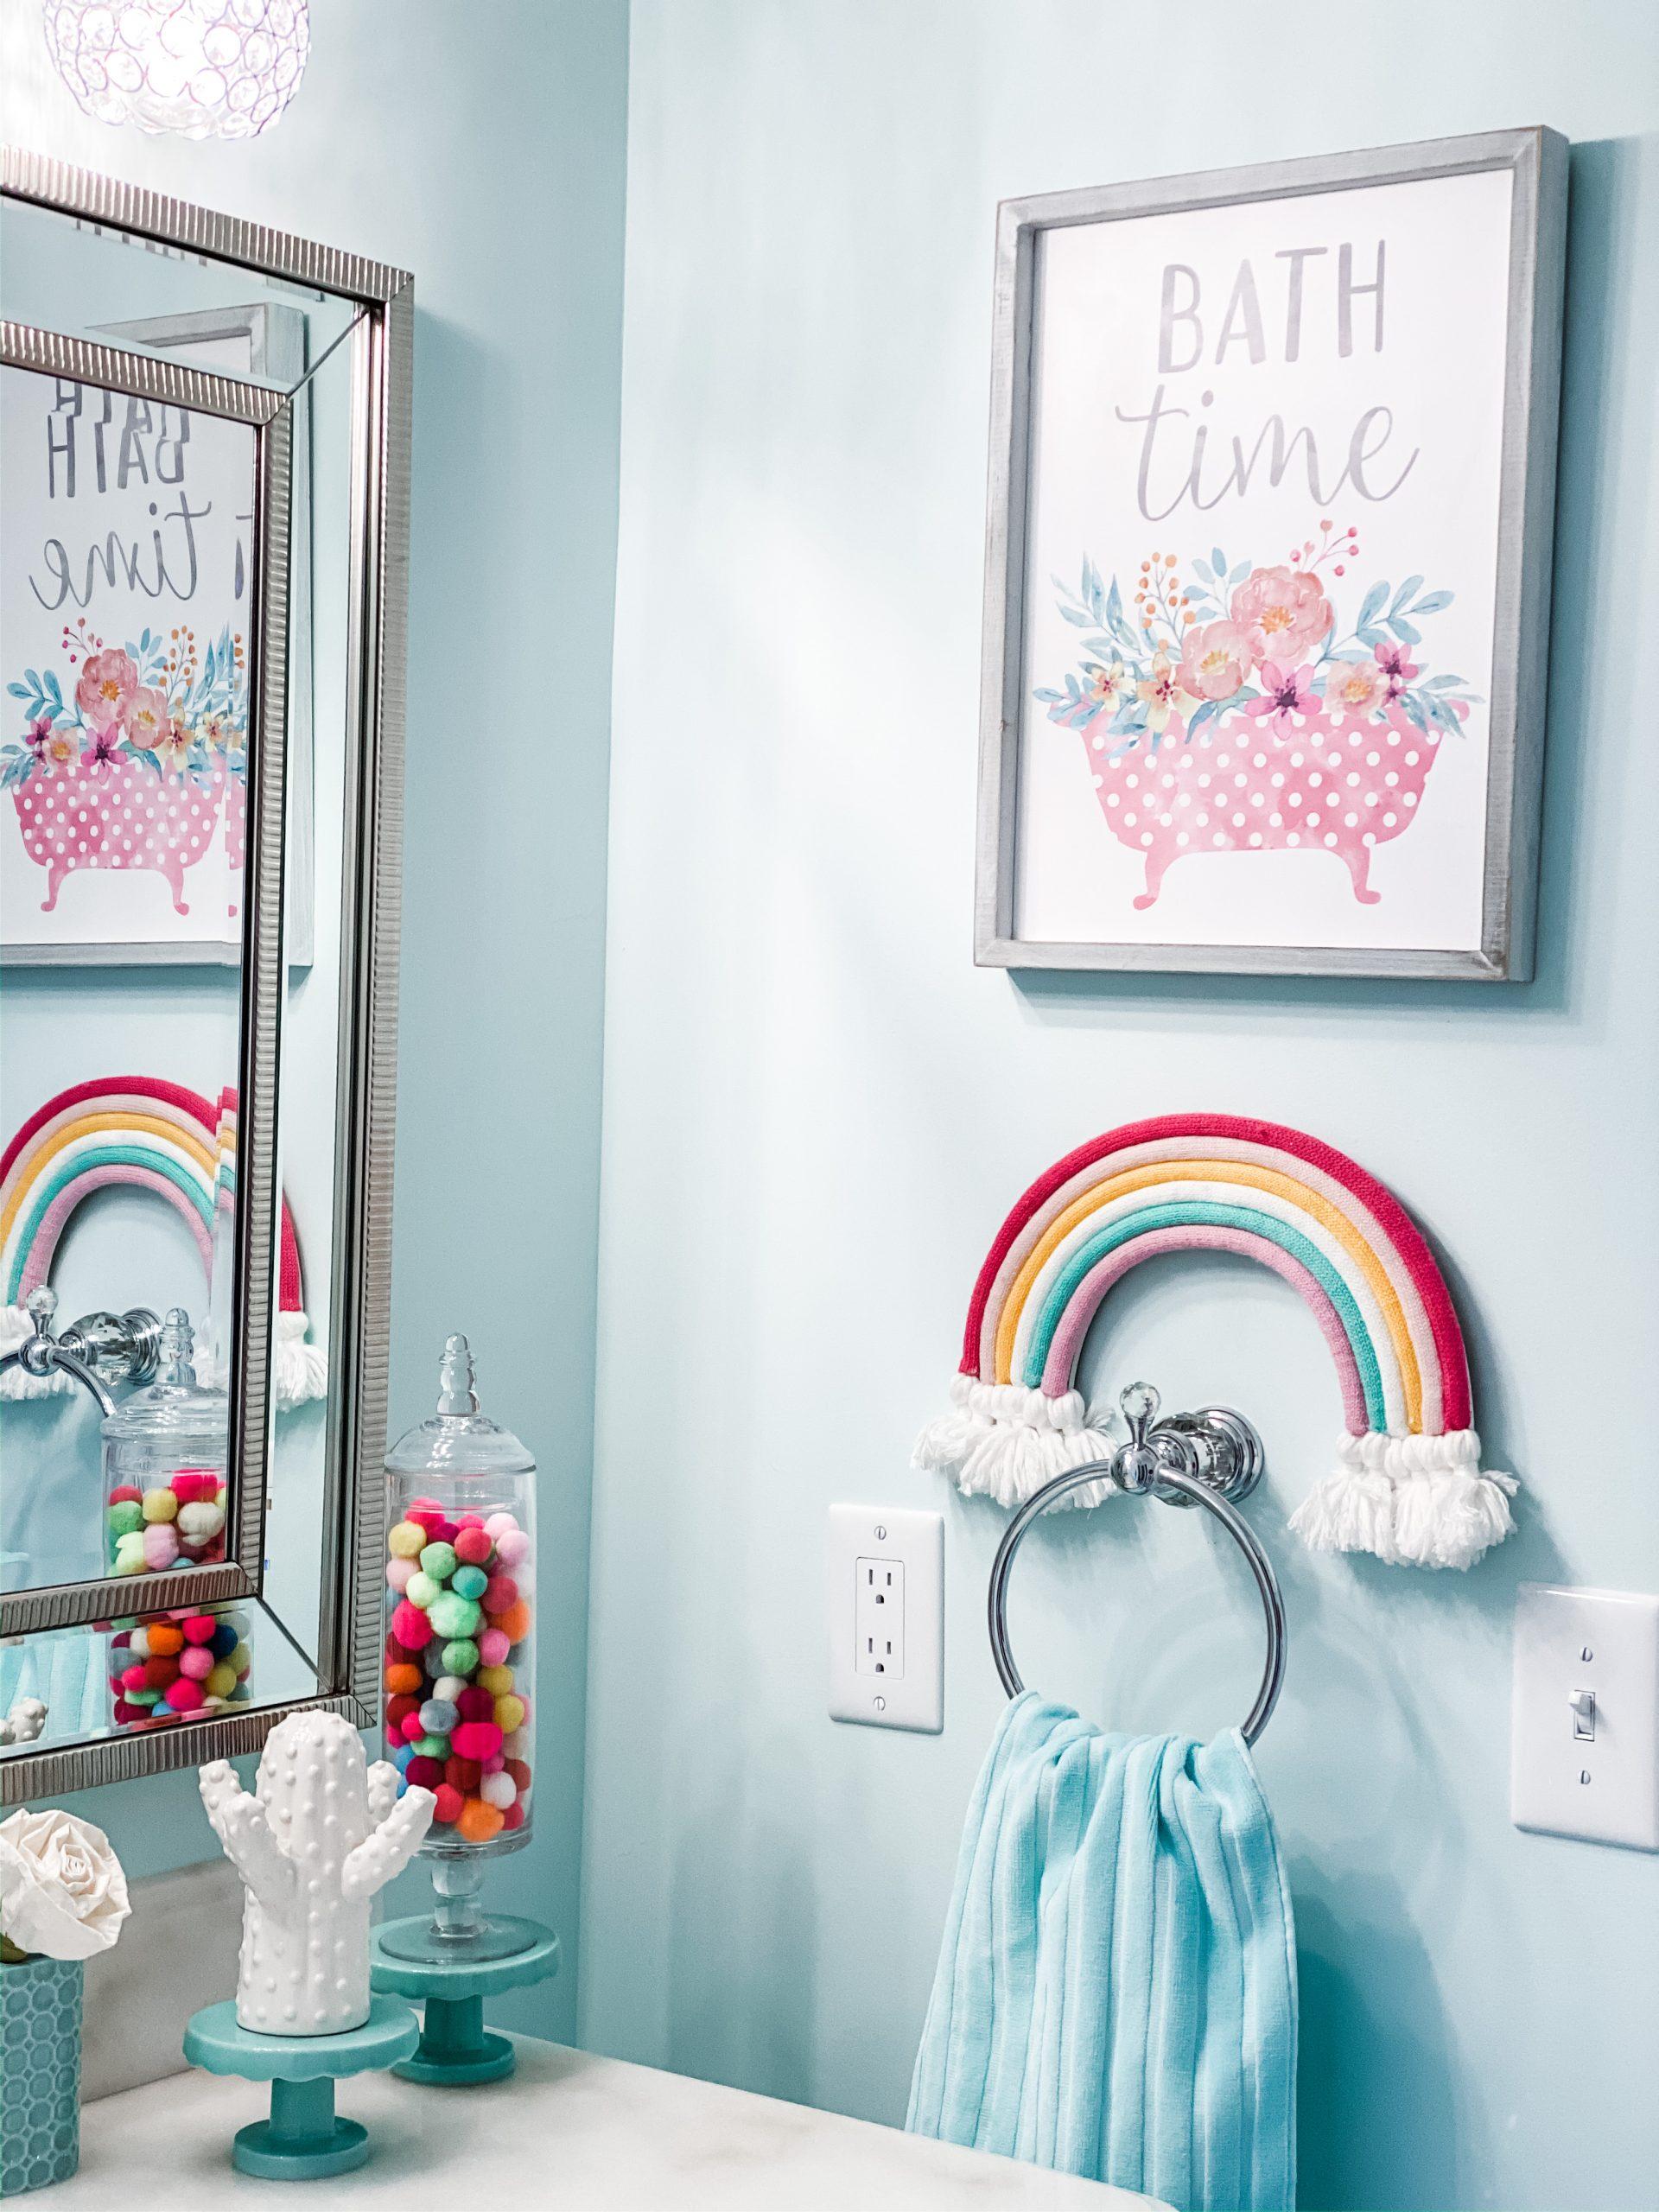 Eden Girls Bathroom Refabbed6 Re Fabbed